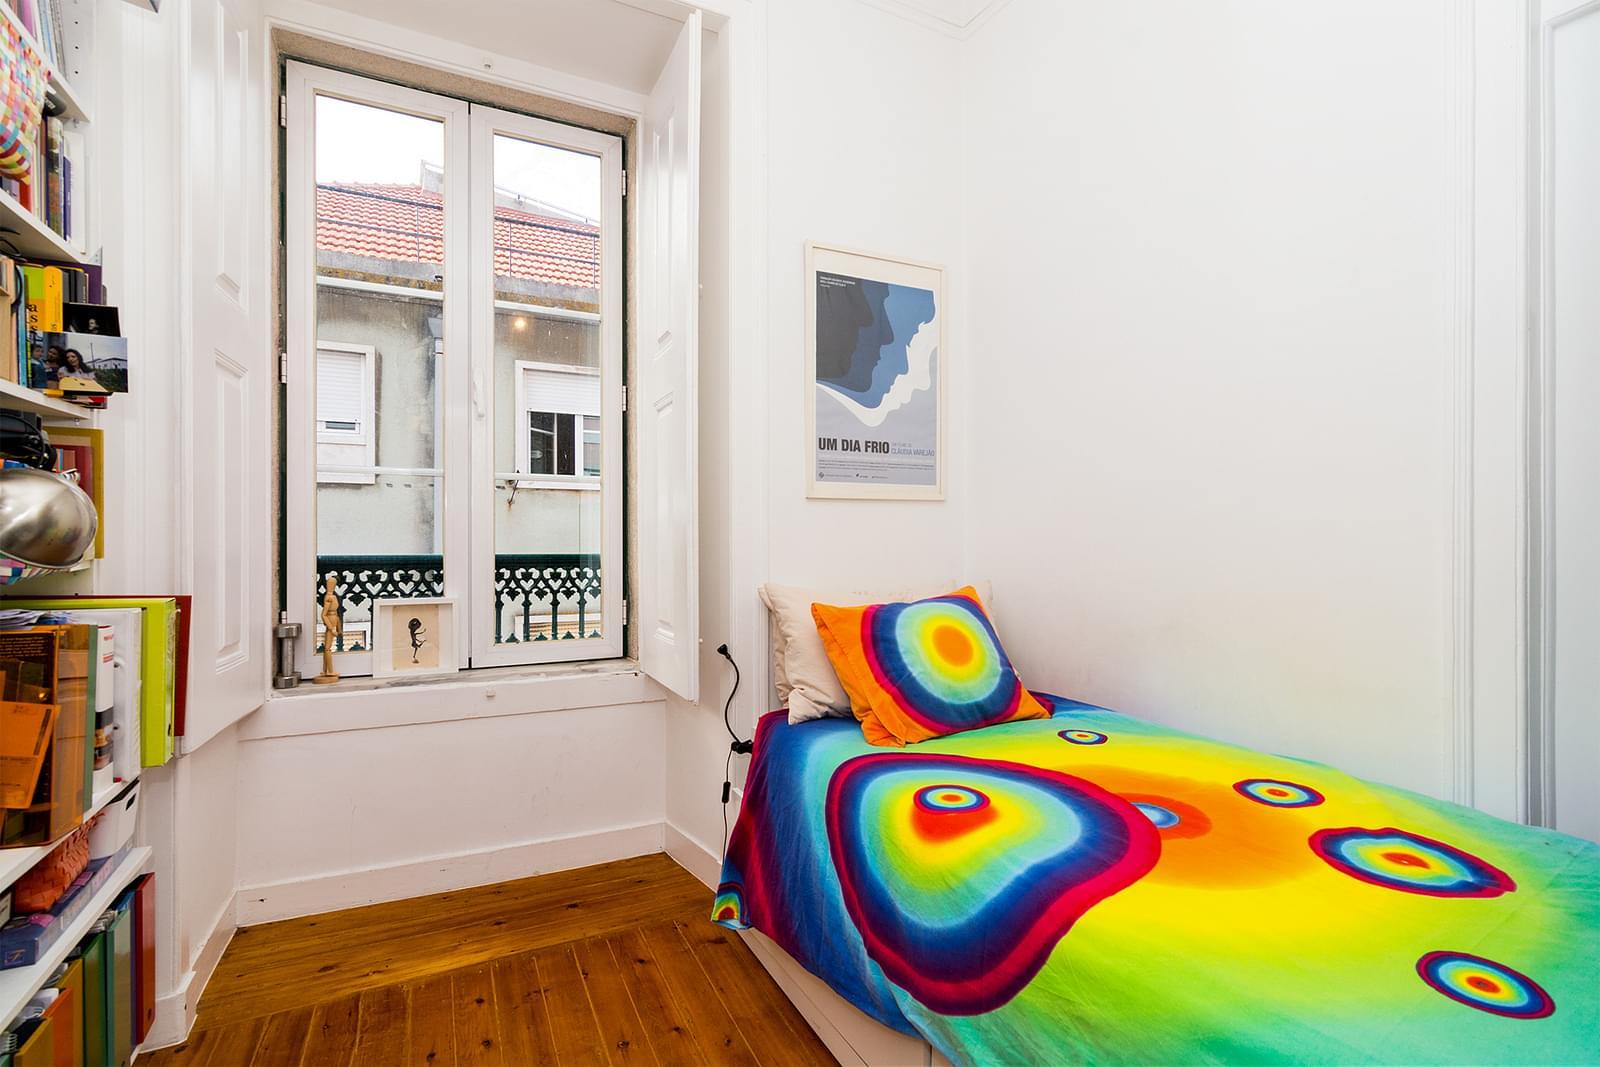 pf17497-apartamento-t3-lisboa-64abd0f5-ac2c-4632-90f3-be530ba45652